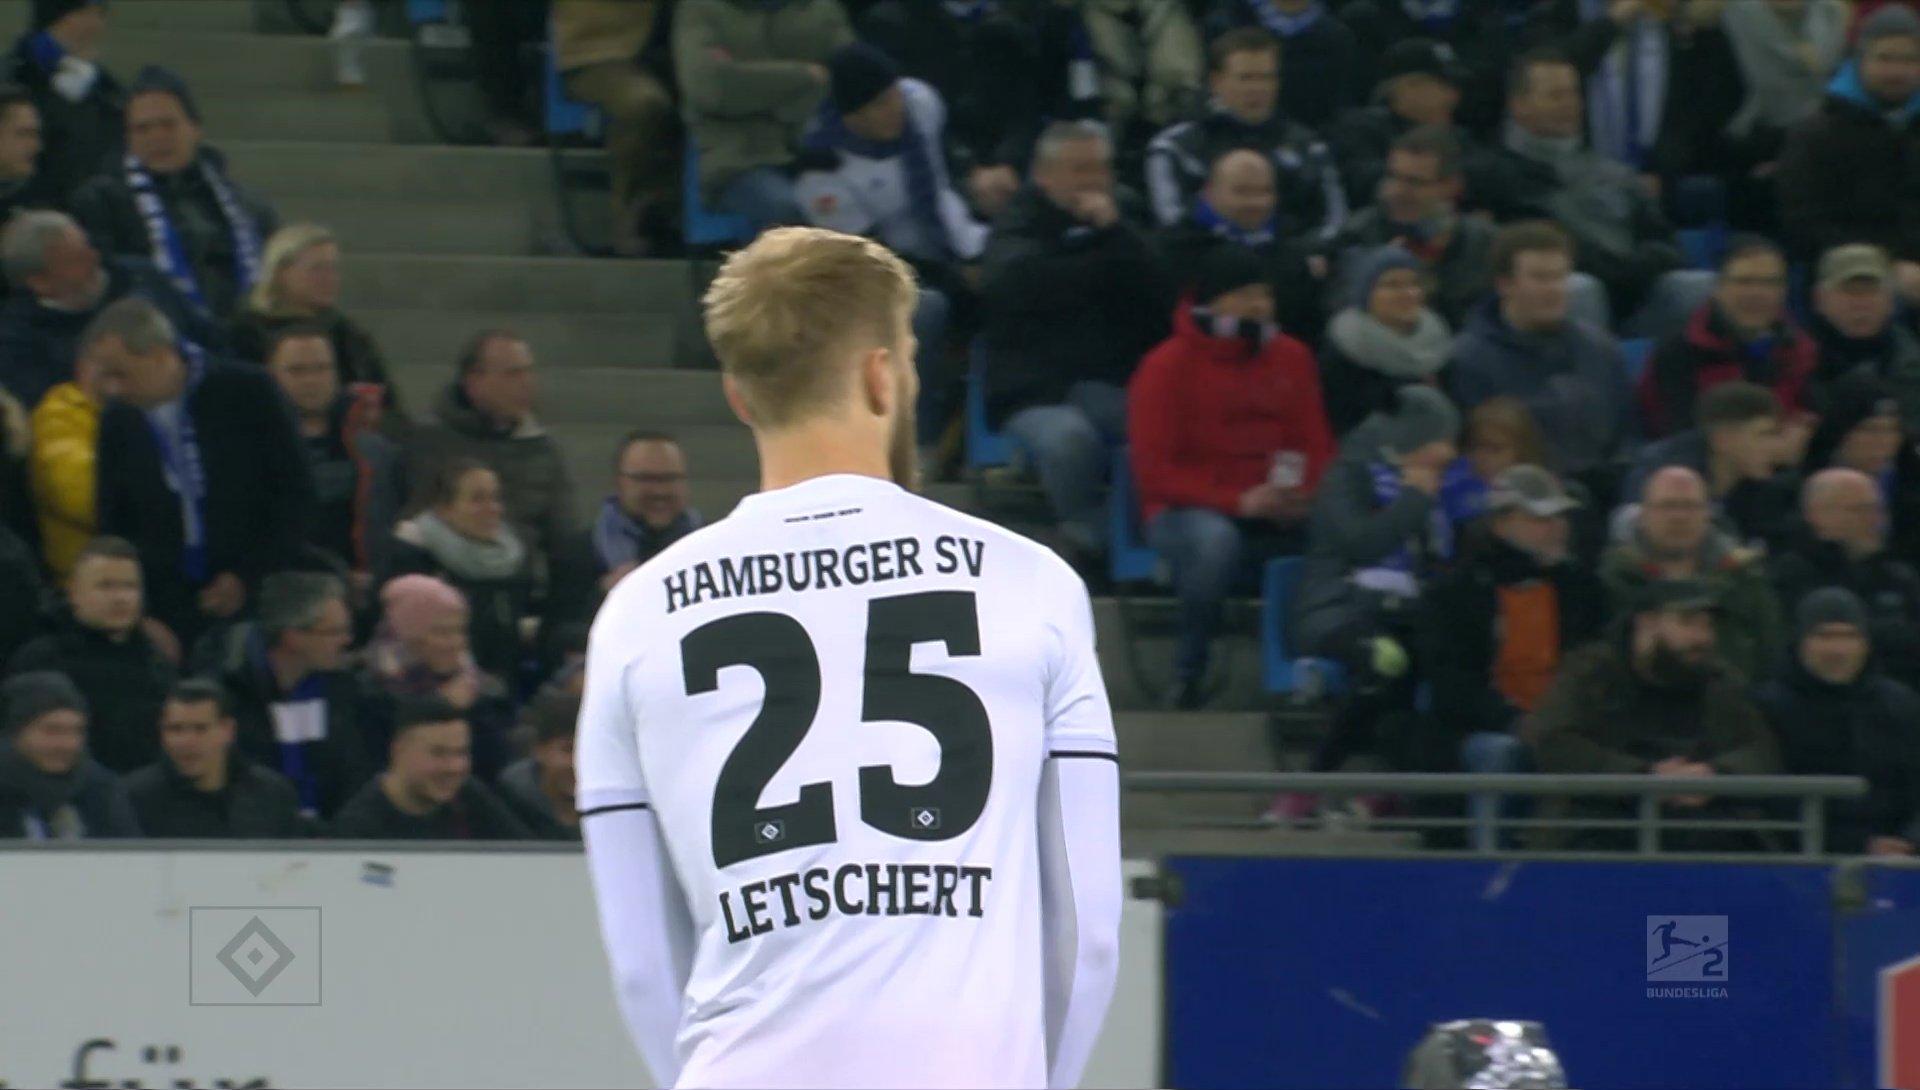 Hamburger Sv Fc